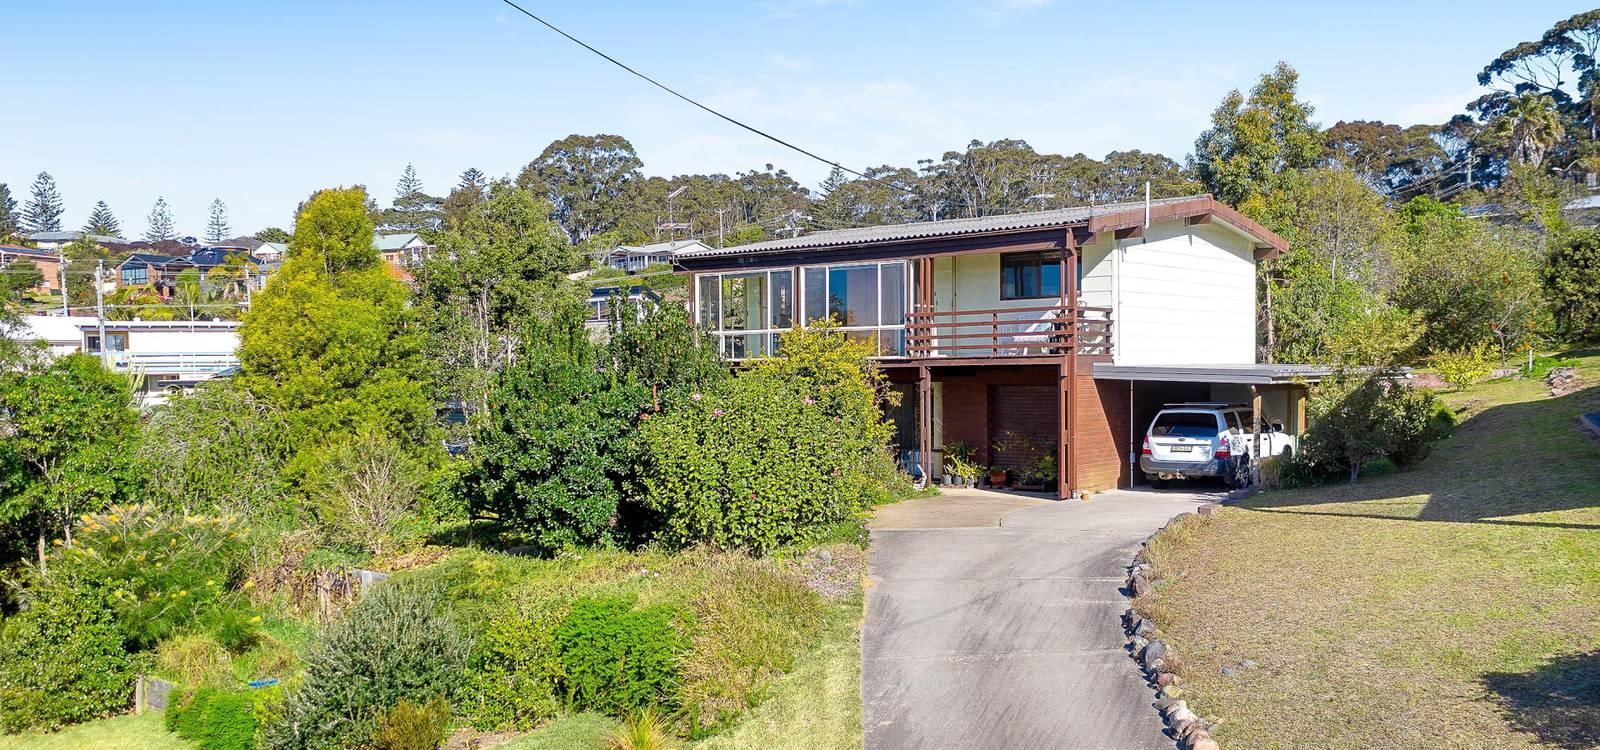 115 Coogee Street TUROSS HEAD, NSW 2537 - photo 1